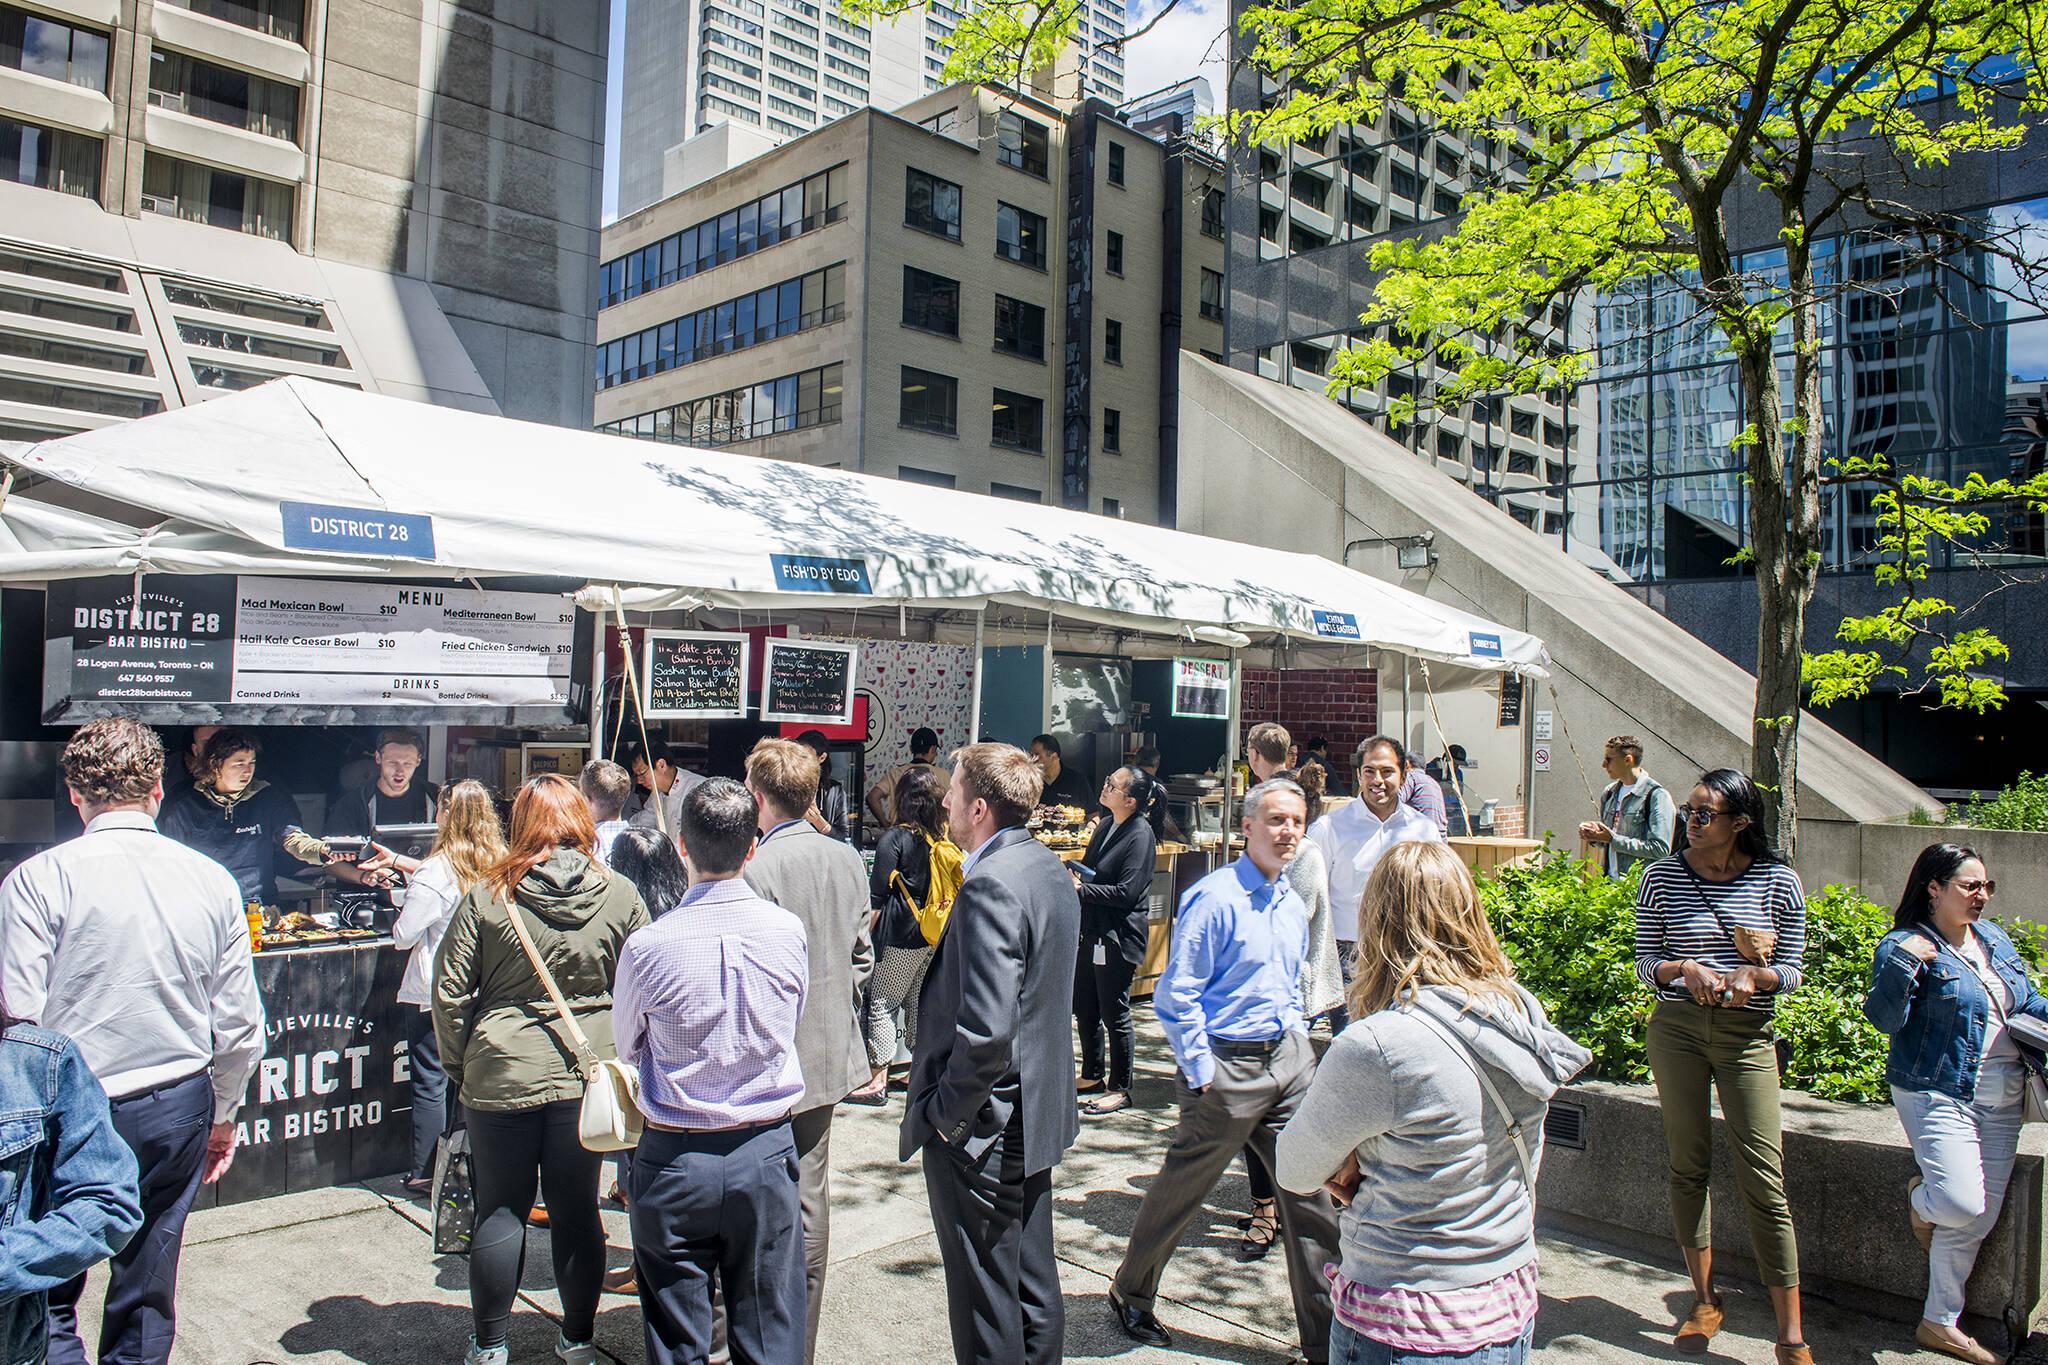 Adelaide Eats Toronto closed